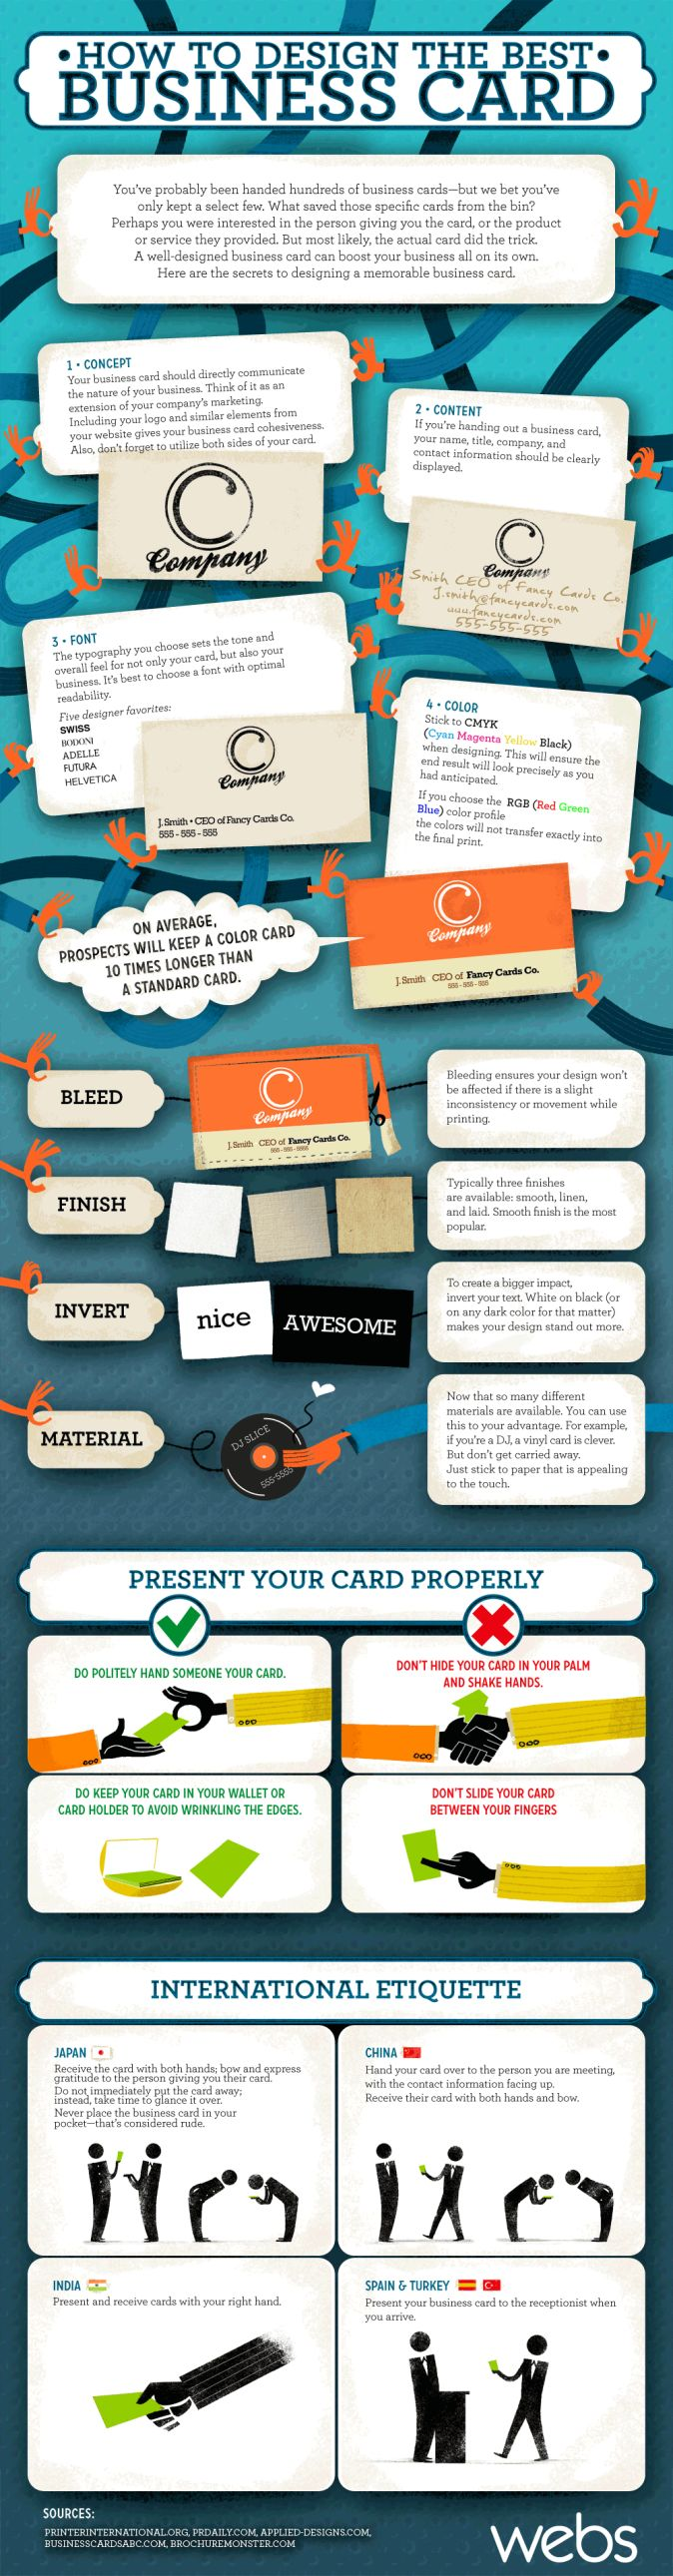 Best 25+ Best business cards ideas on Pinterest | Creative ...